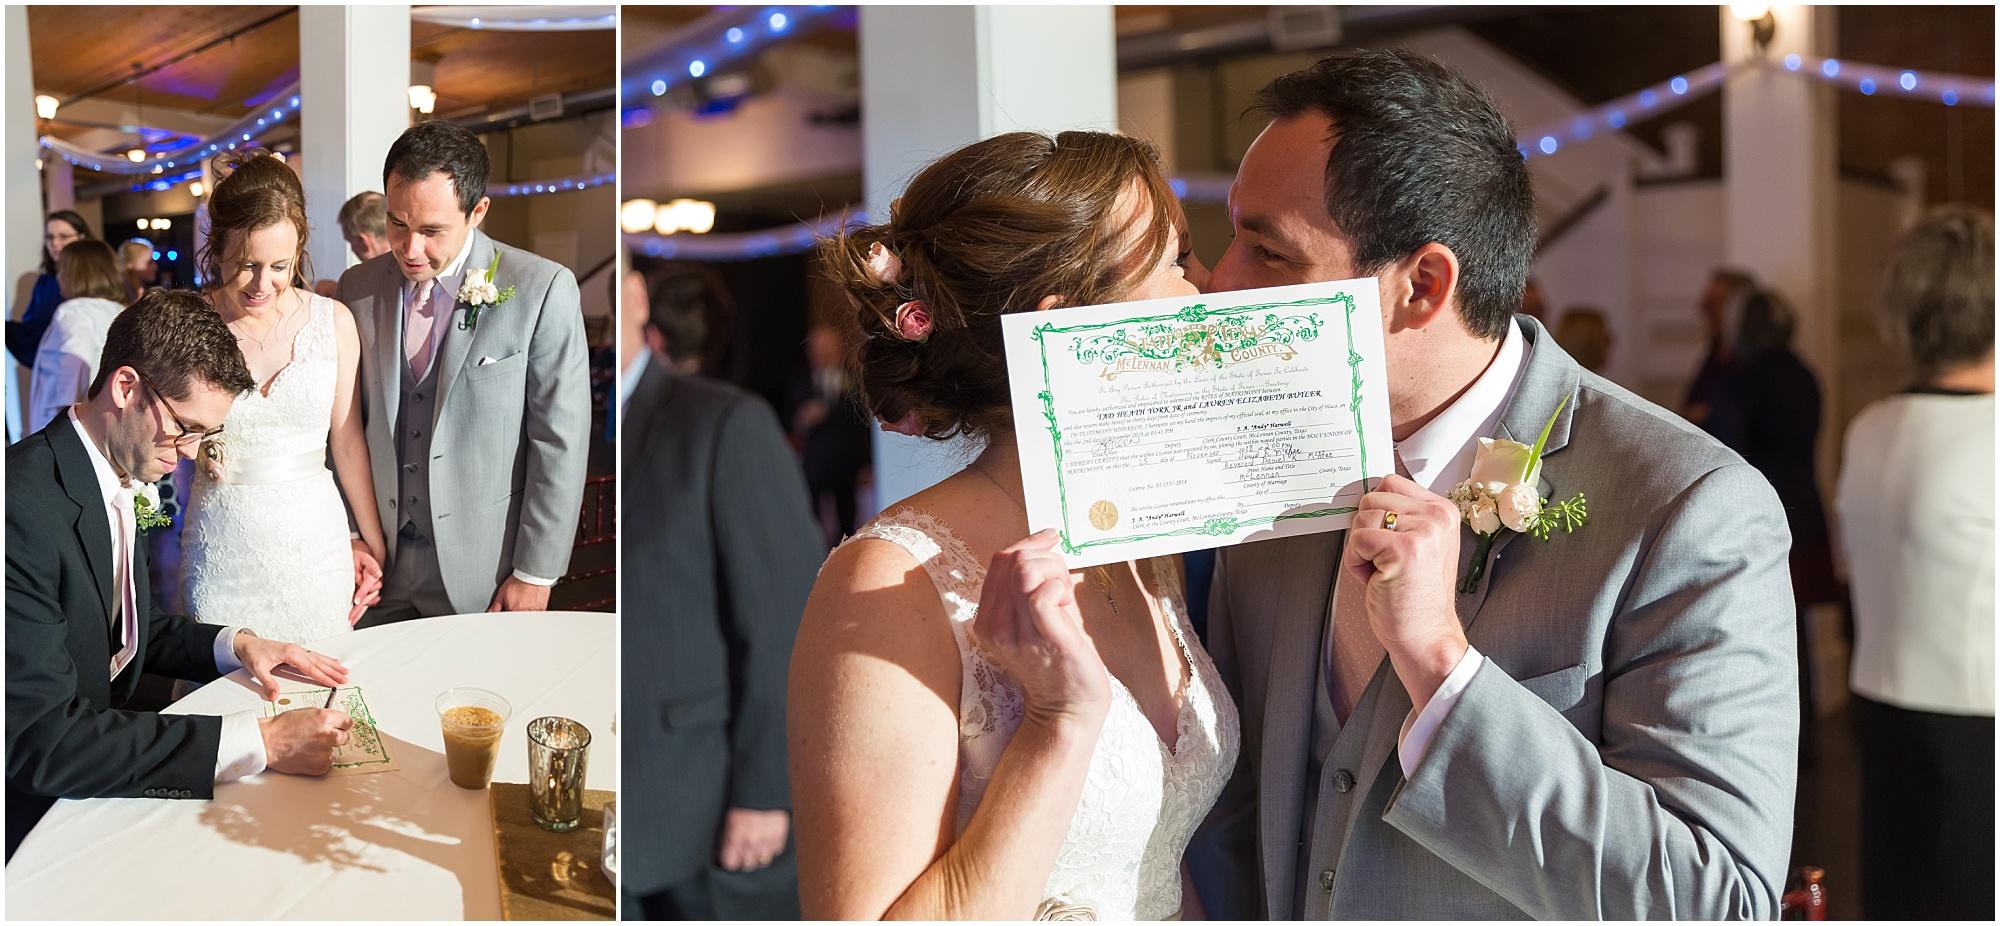 Downtown-Waco-Fall-Wedding_0038.jpg